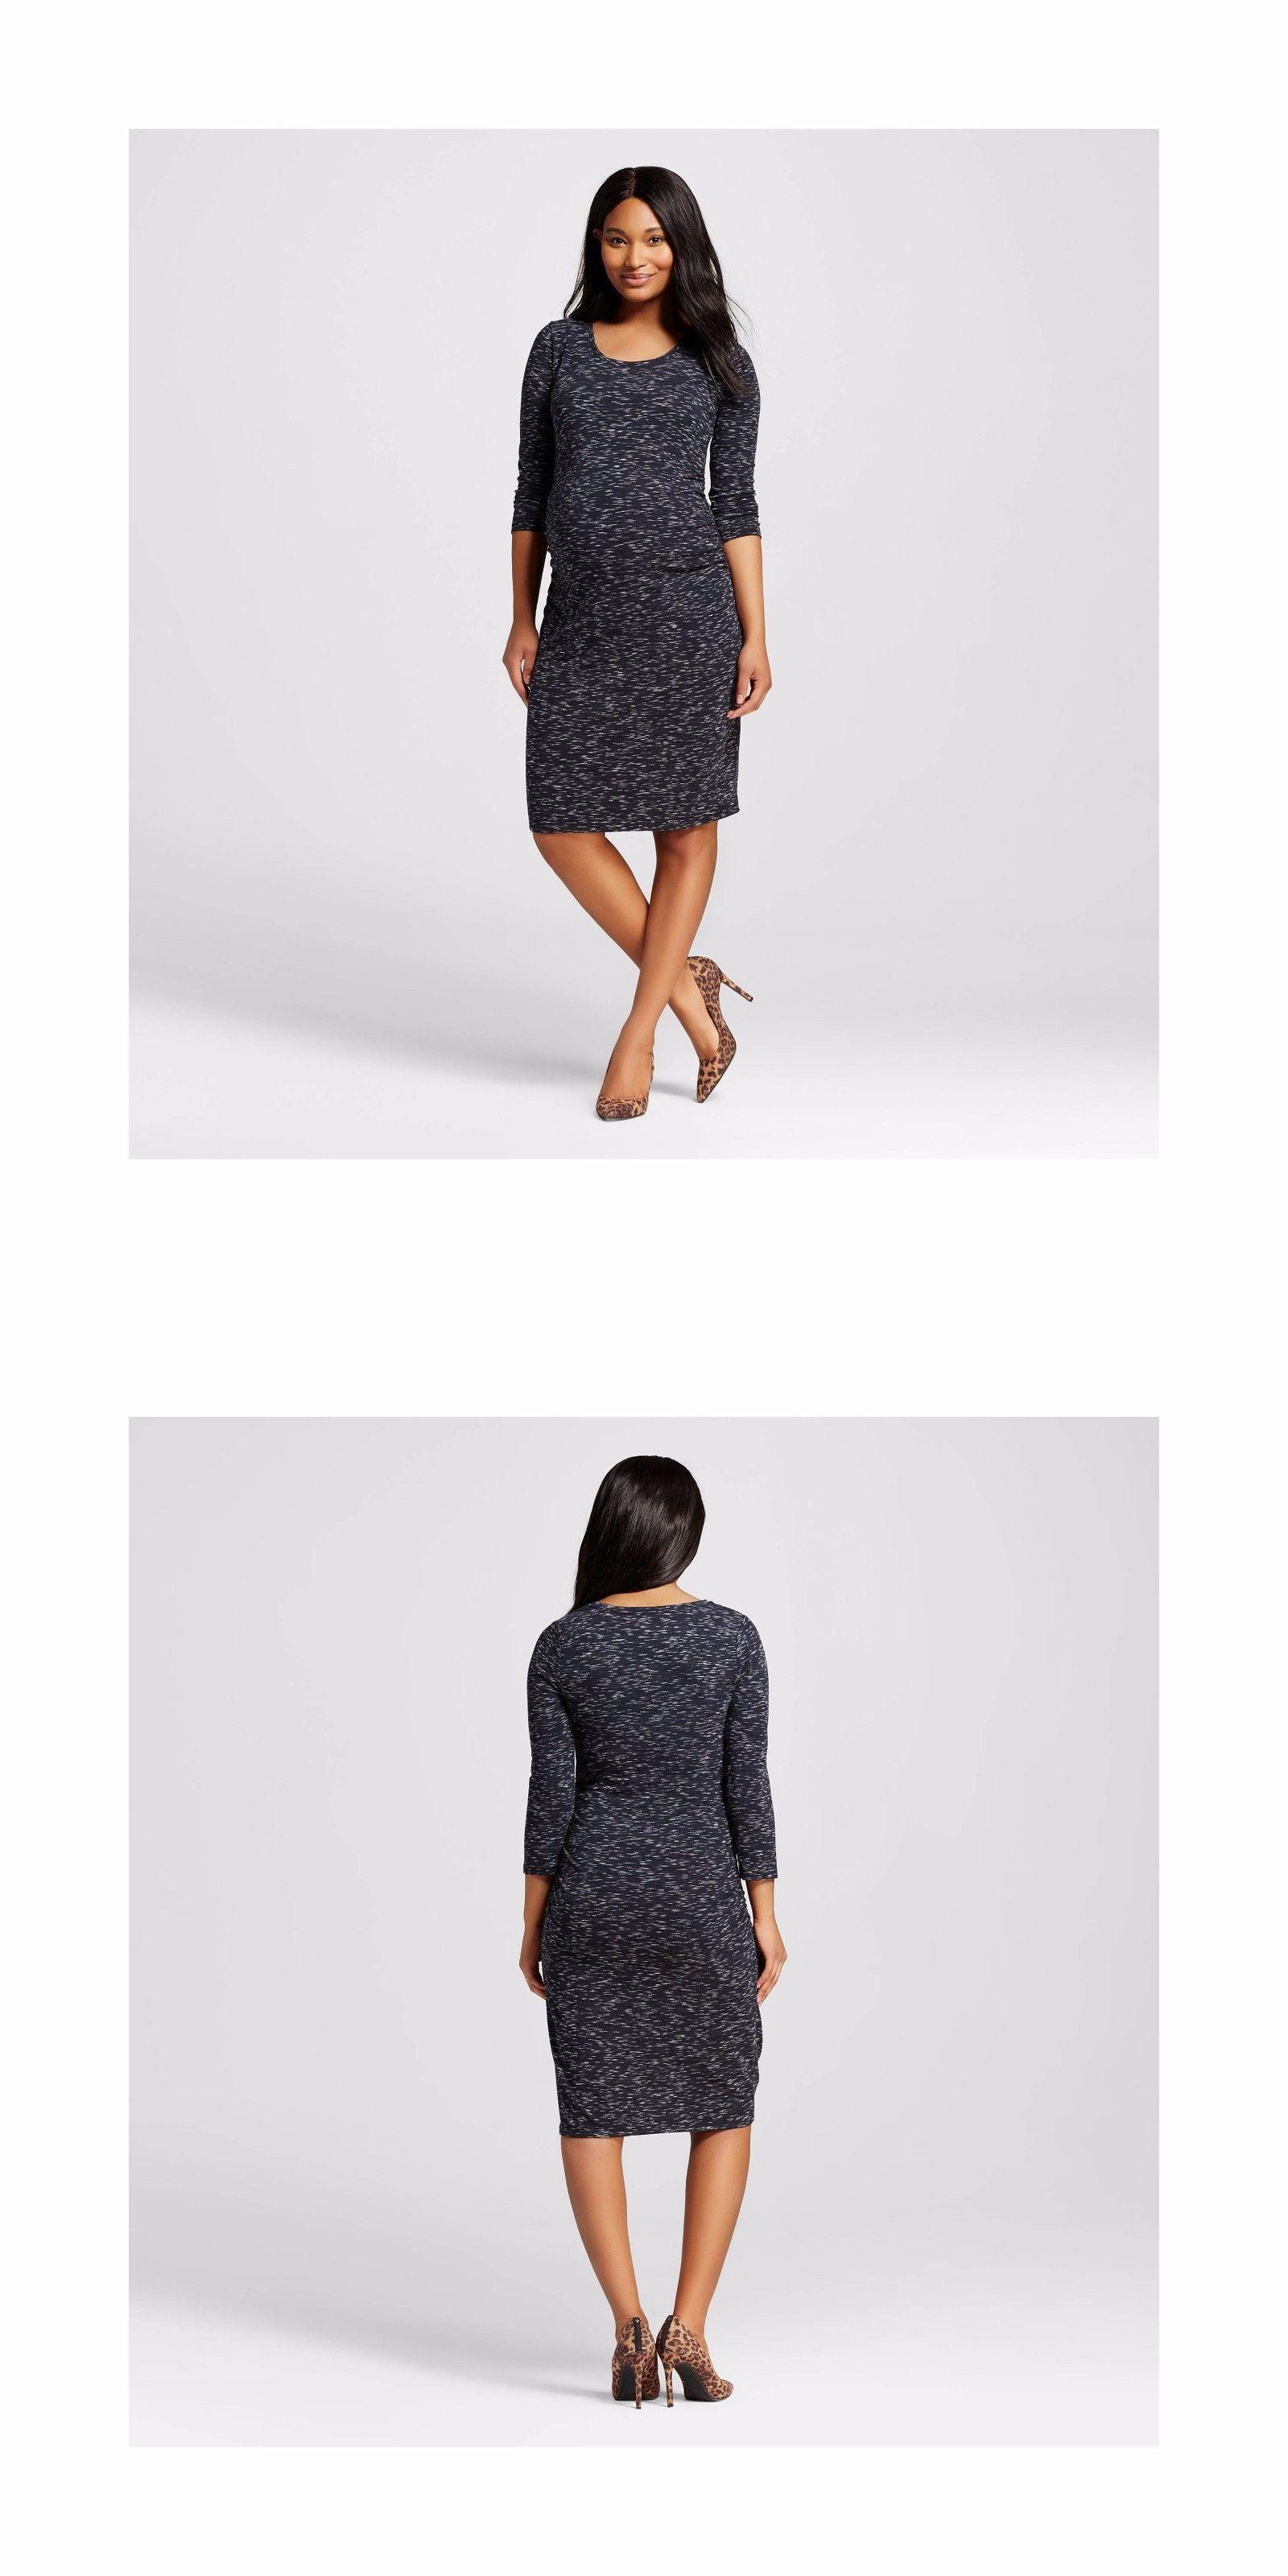 e4d3445bbdd64 Dresses 11534: Sexy Liz Lange Maternity Black Spacedye Sleeve T-Shirt Dress  S M L Xl -> BUY IT NOW ONLY: $11.54 on #eBay #dresses #lange #maternity  #black ...